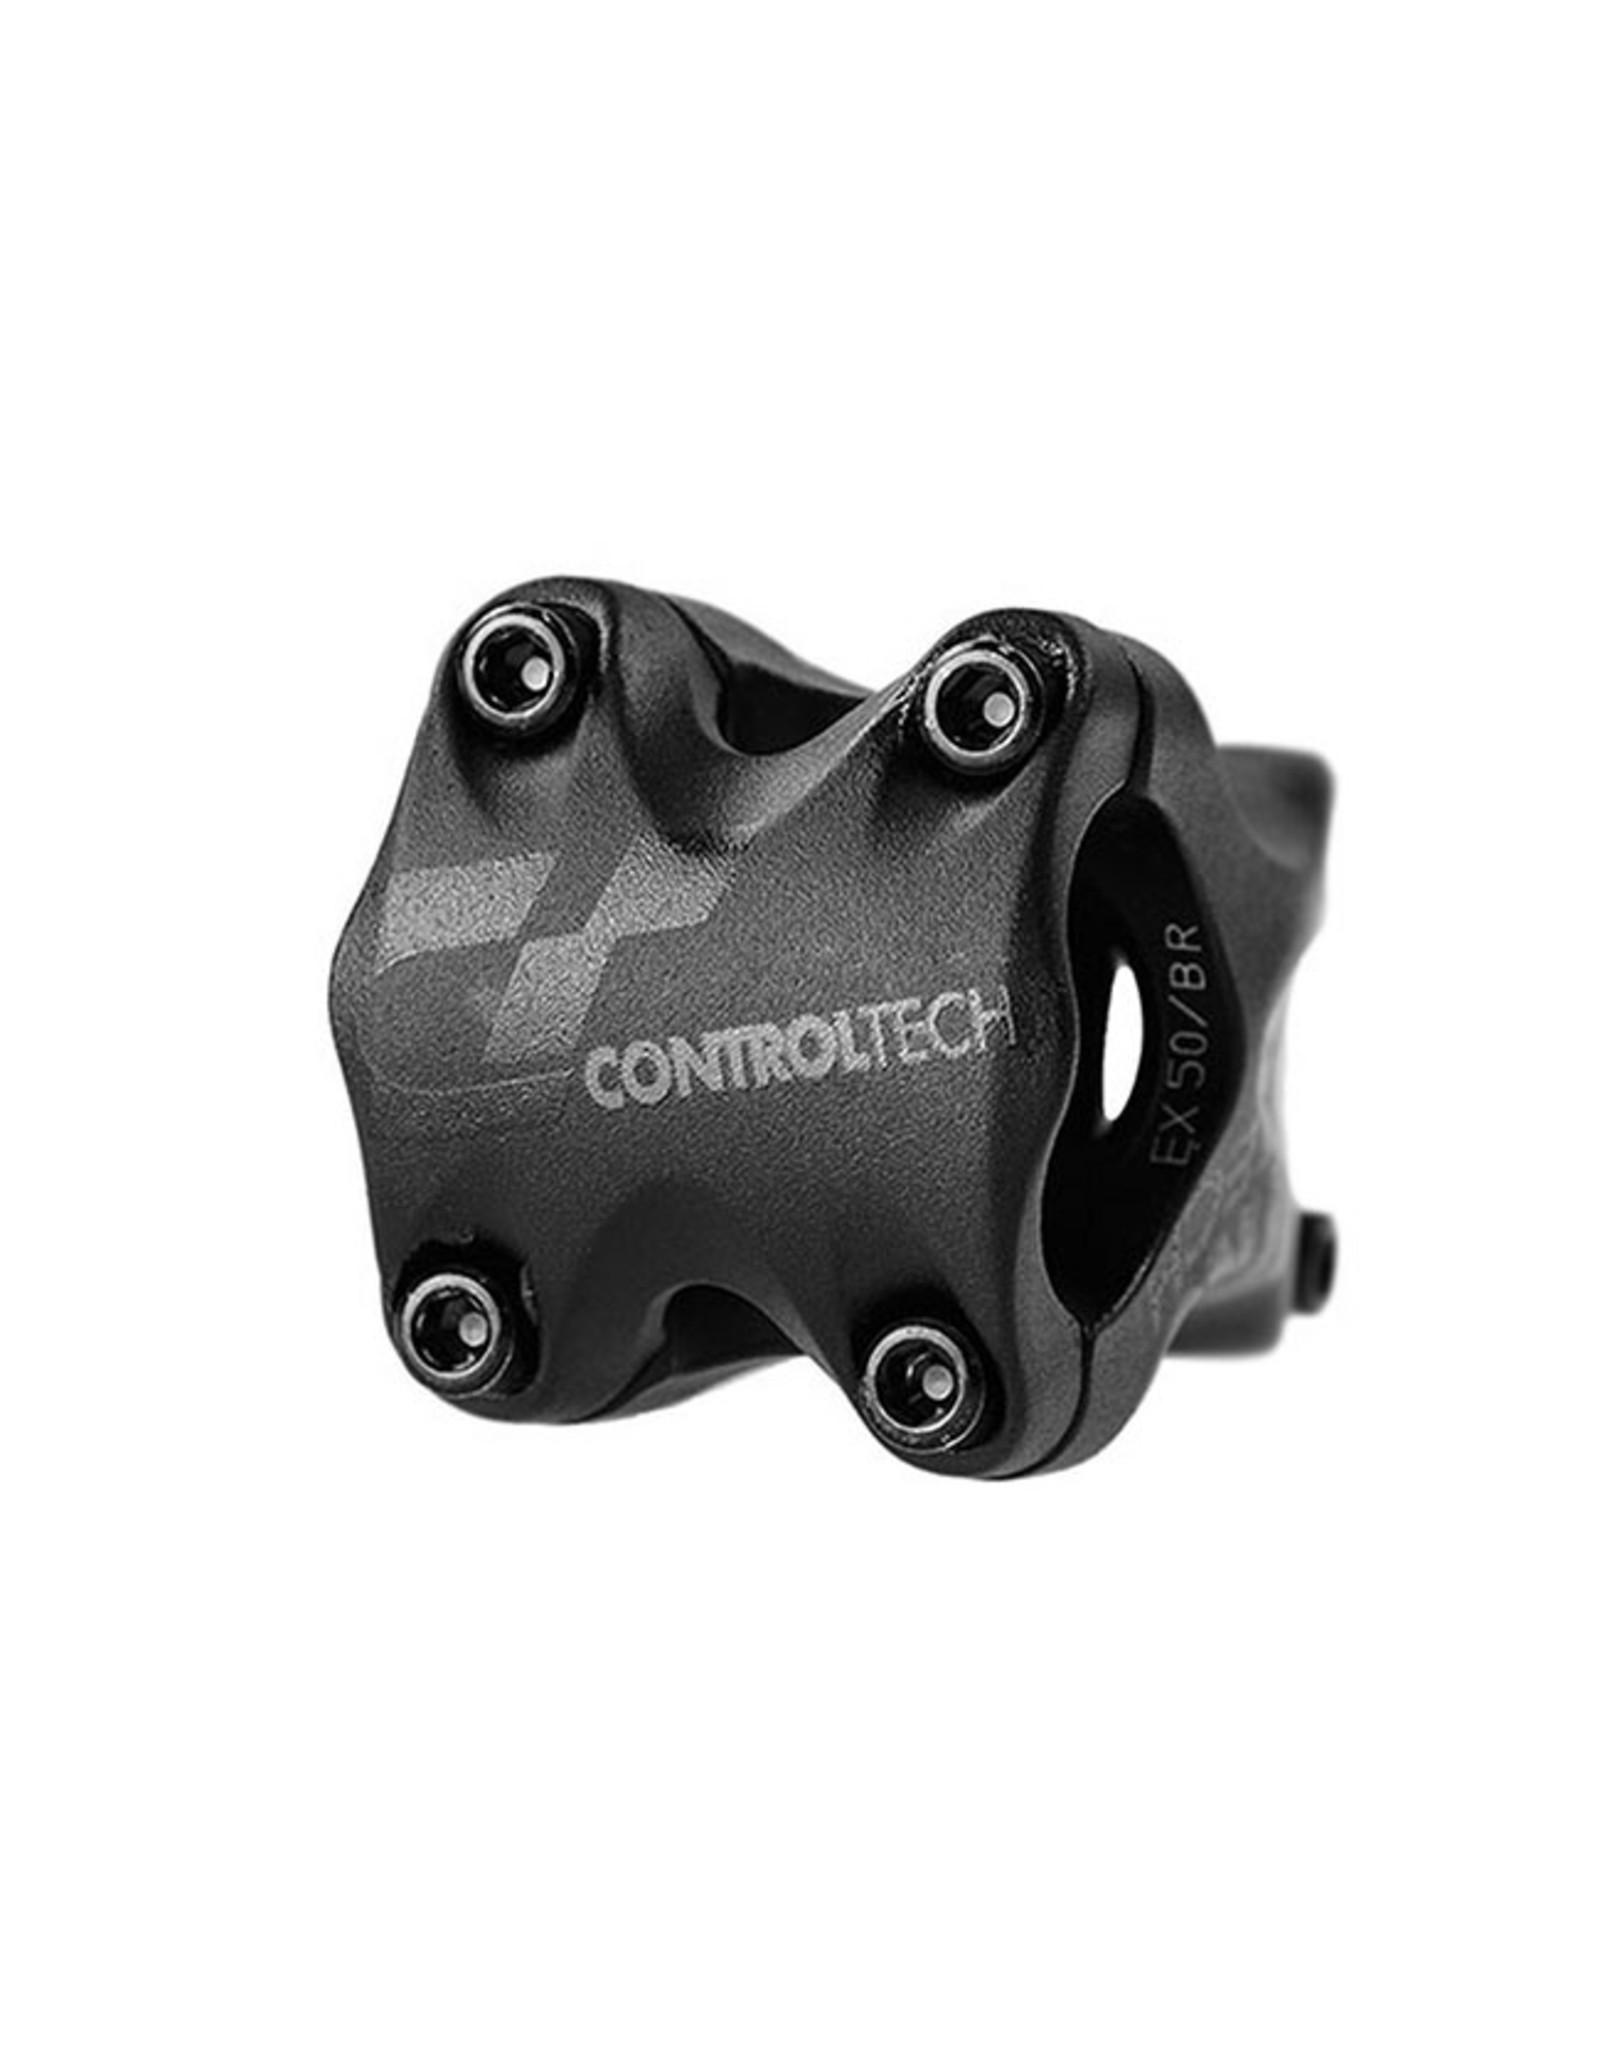 ControlTech ControlTech Lynx Stem